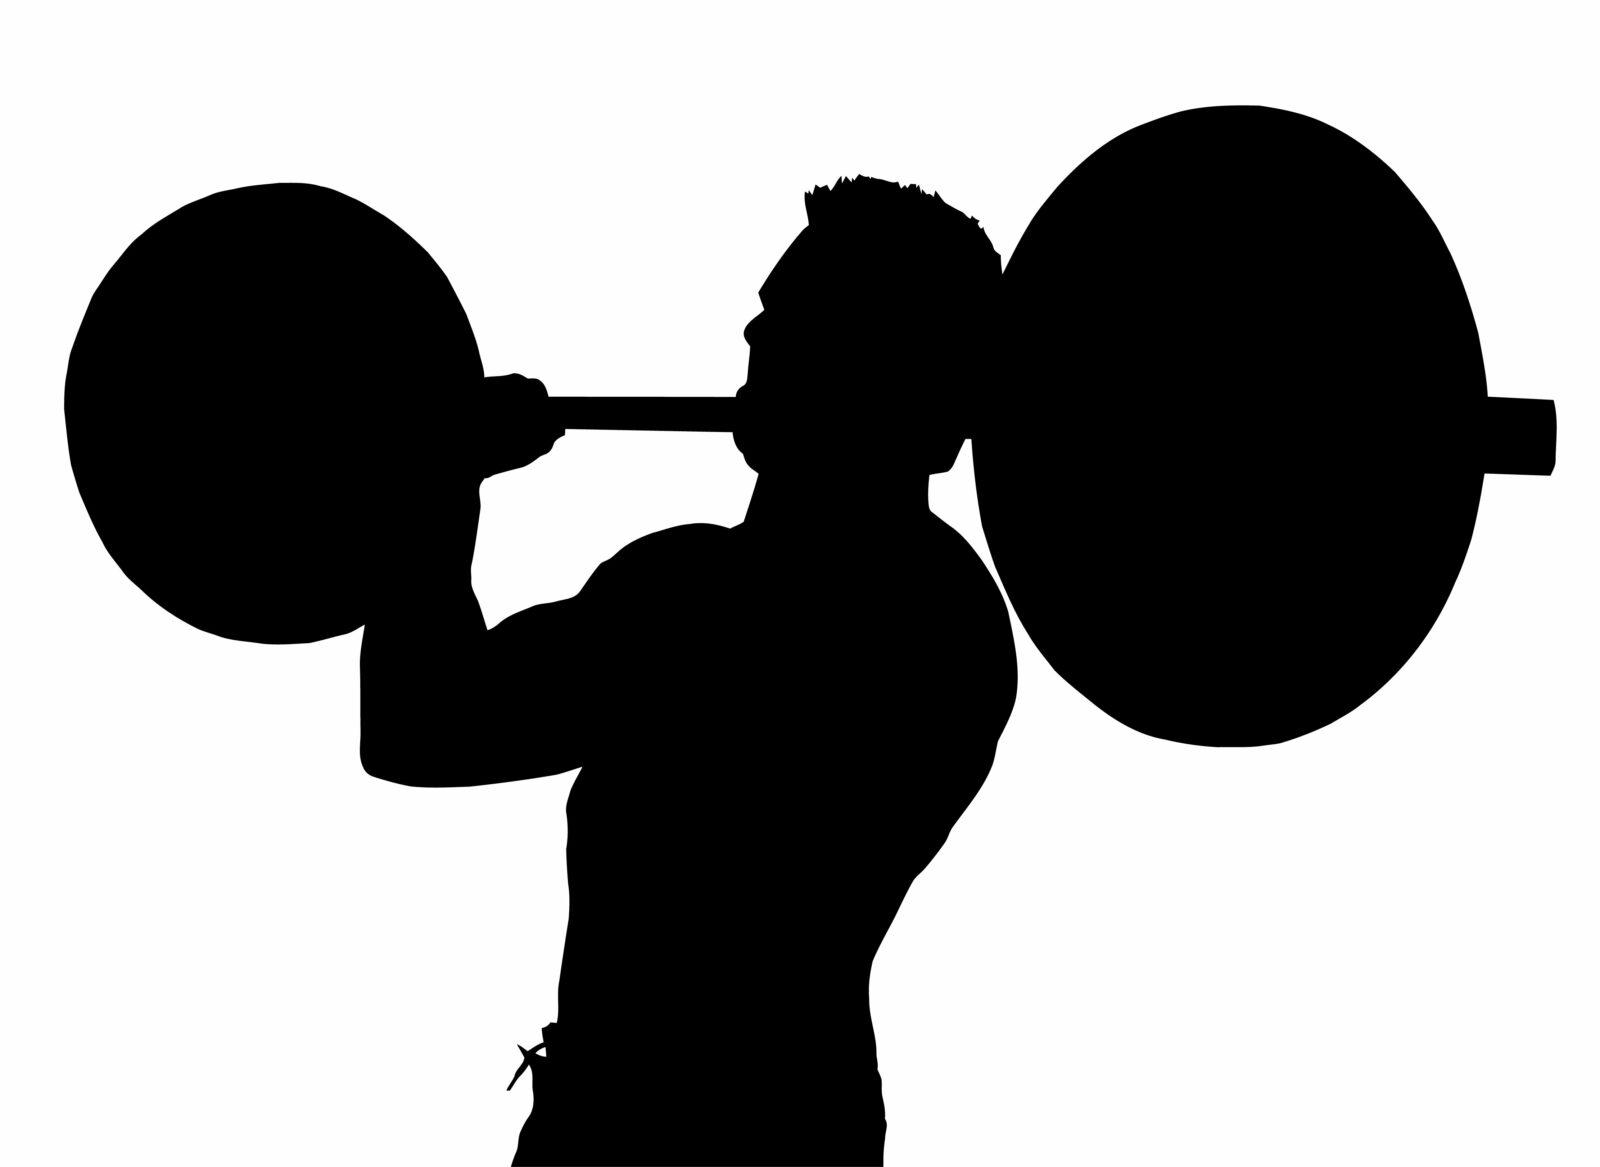 Paul Madsen, weight lifting